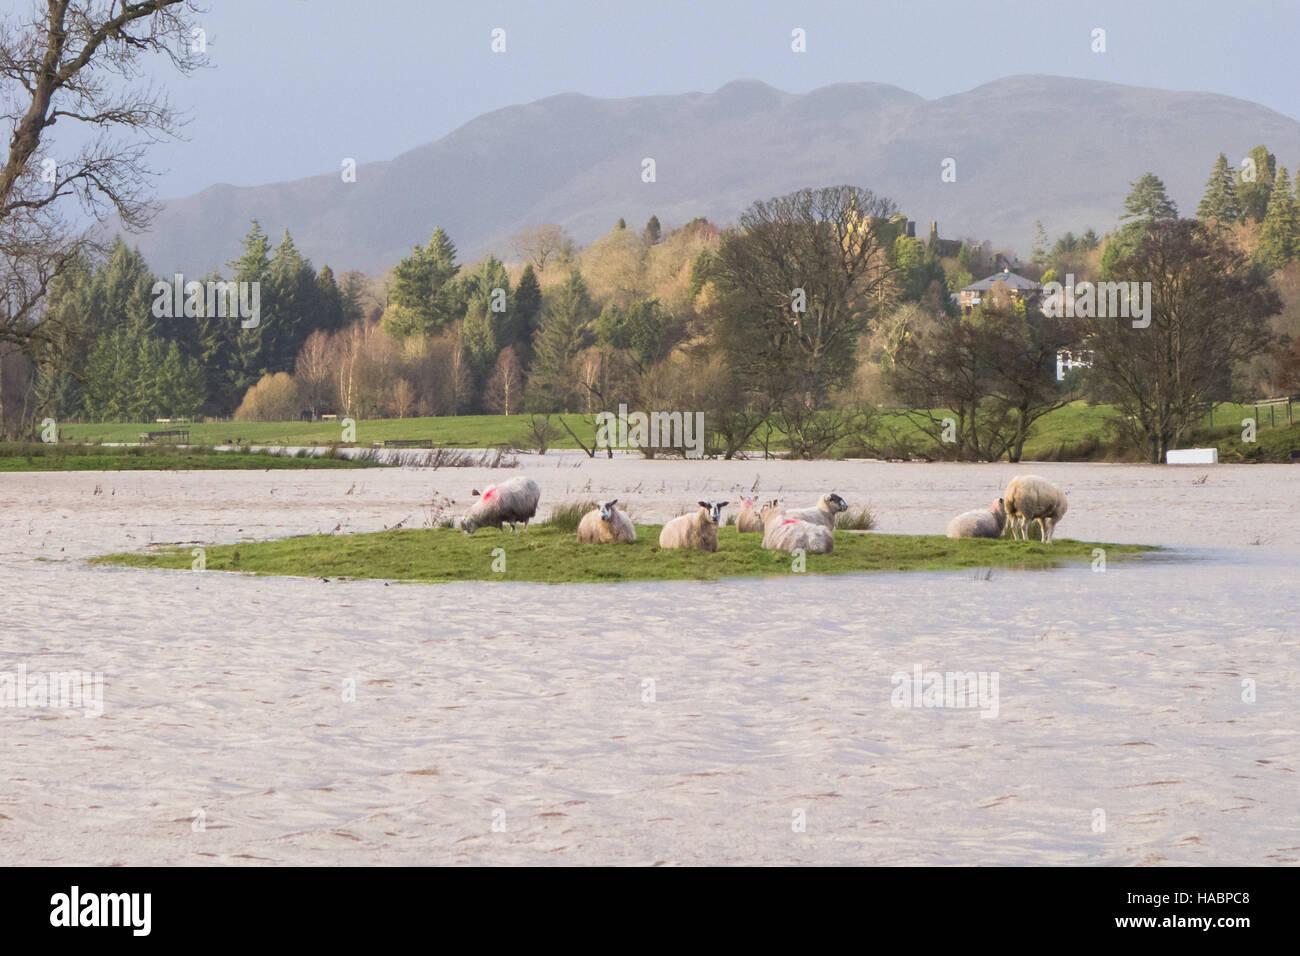 flooded fields - stranded sheep in flooded field, Drymen, Scotland, UK - Stock Image